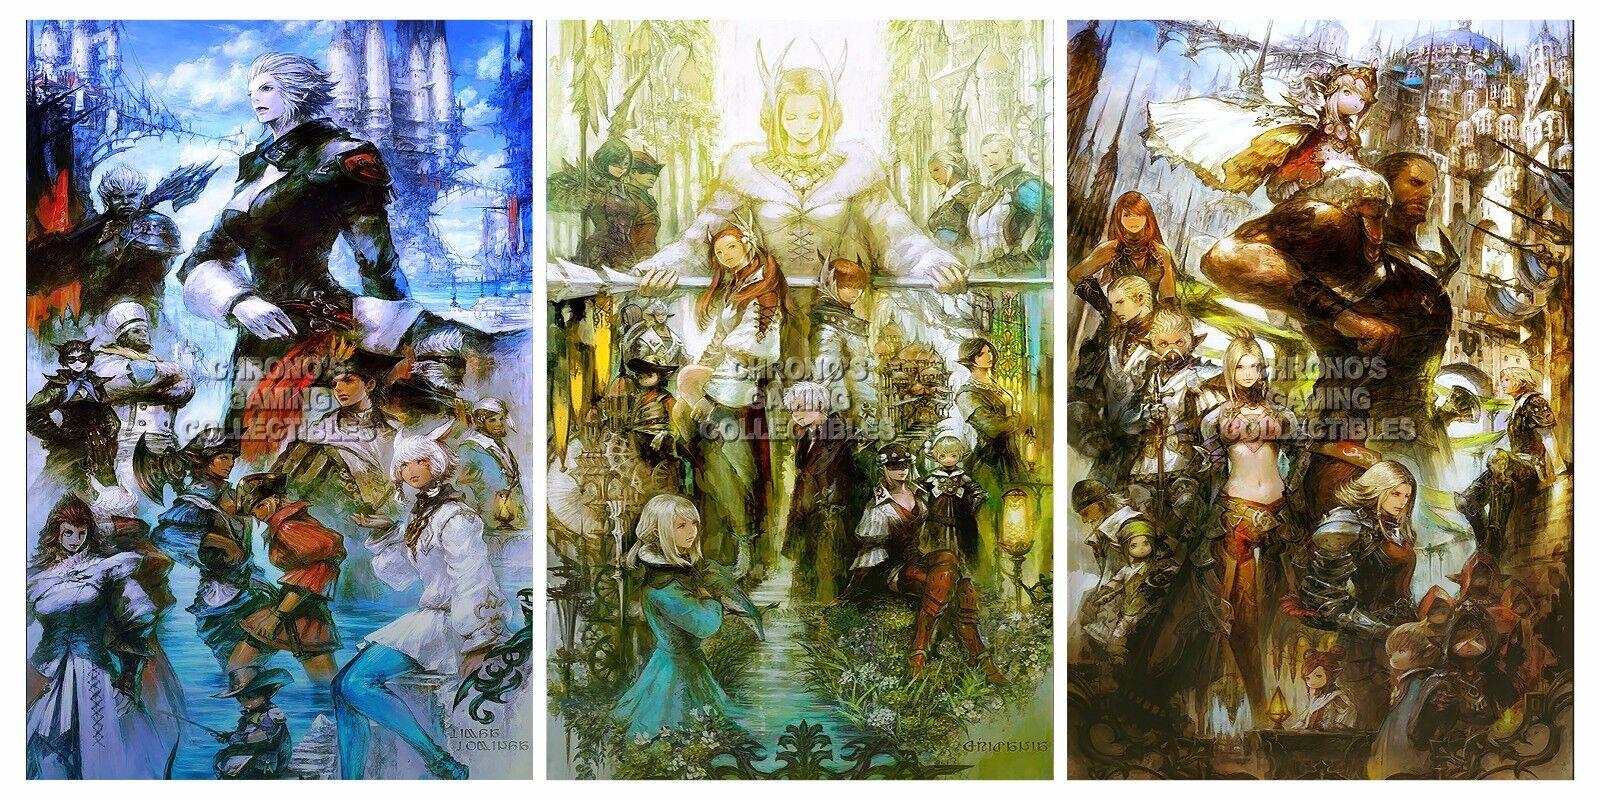 RGC Huge Poster - Final Fantasy XIV Art Posters PS3 PS4 - FXIVSET1